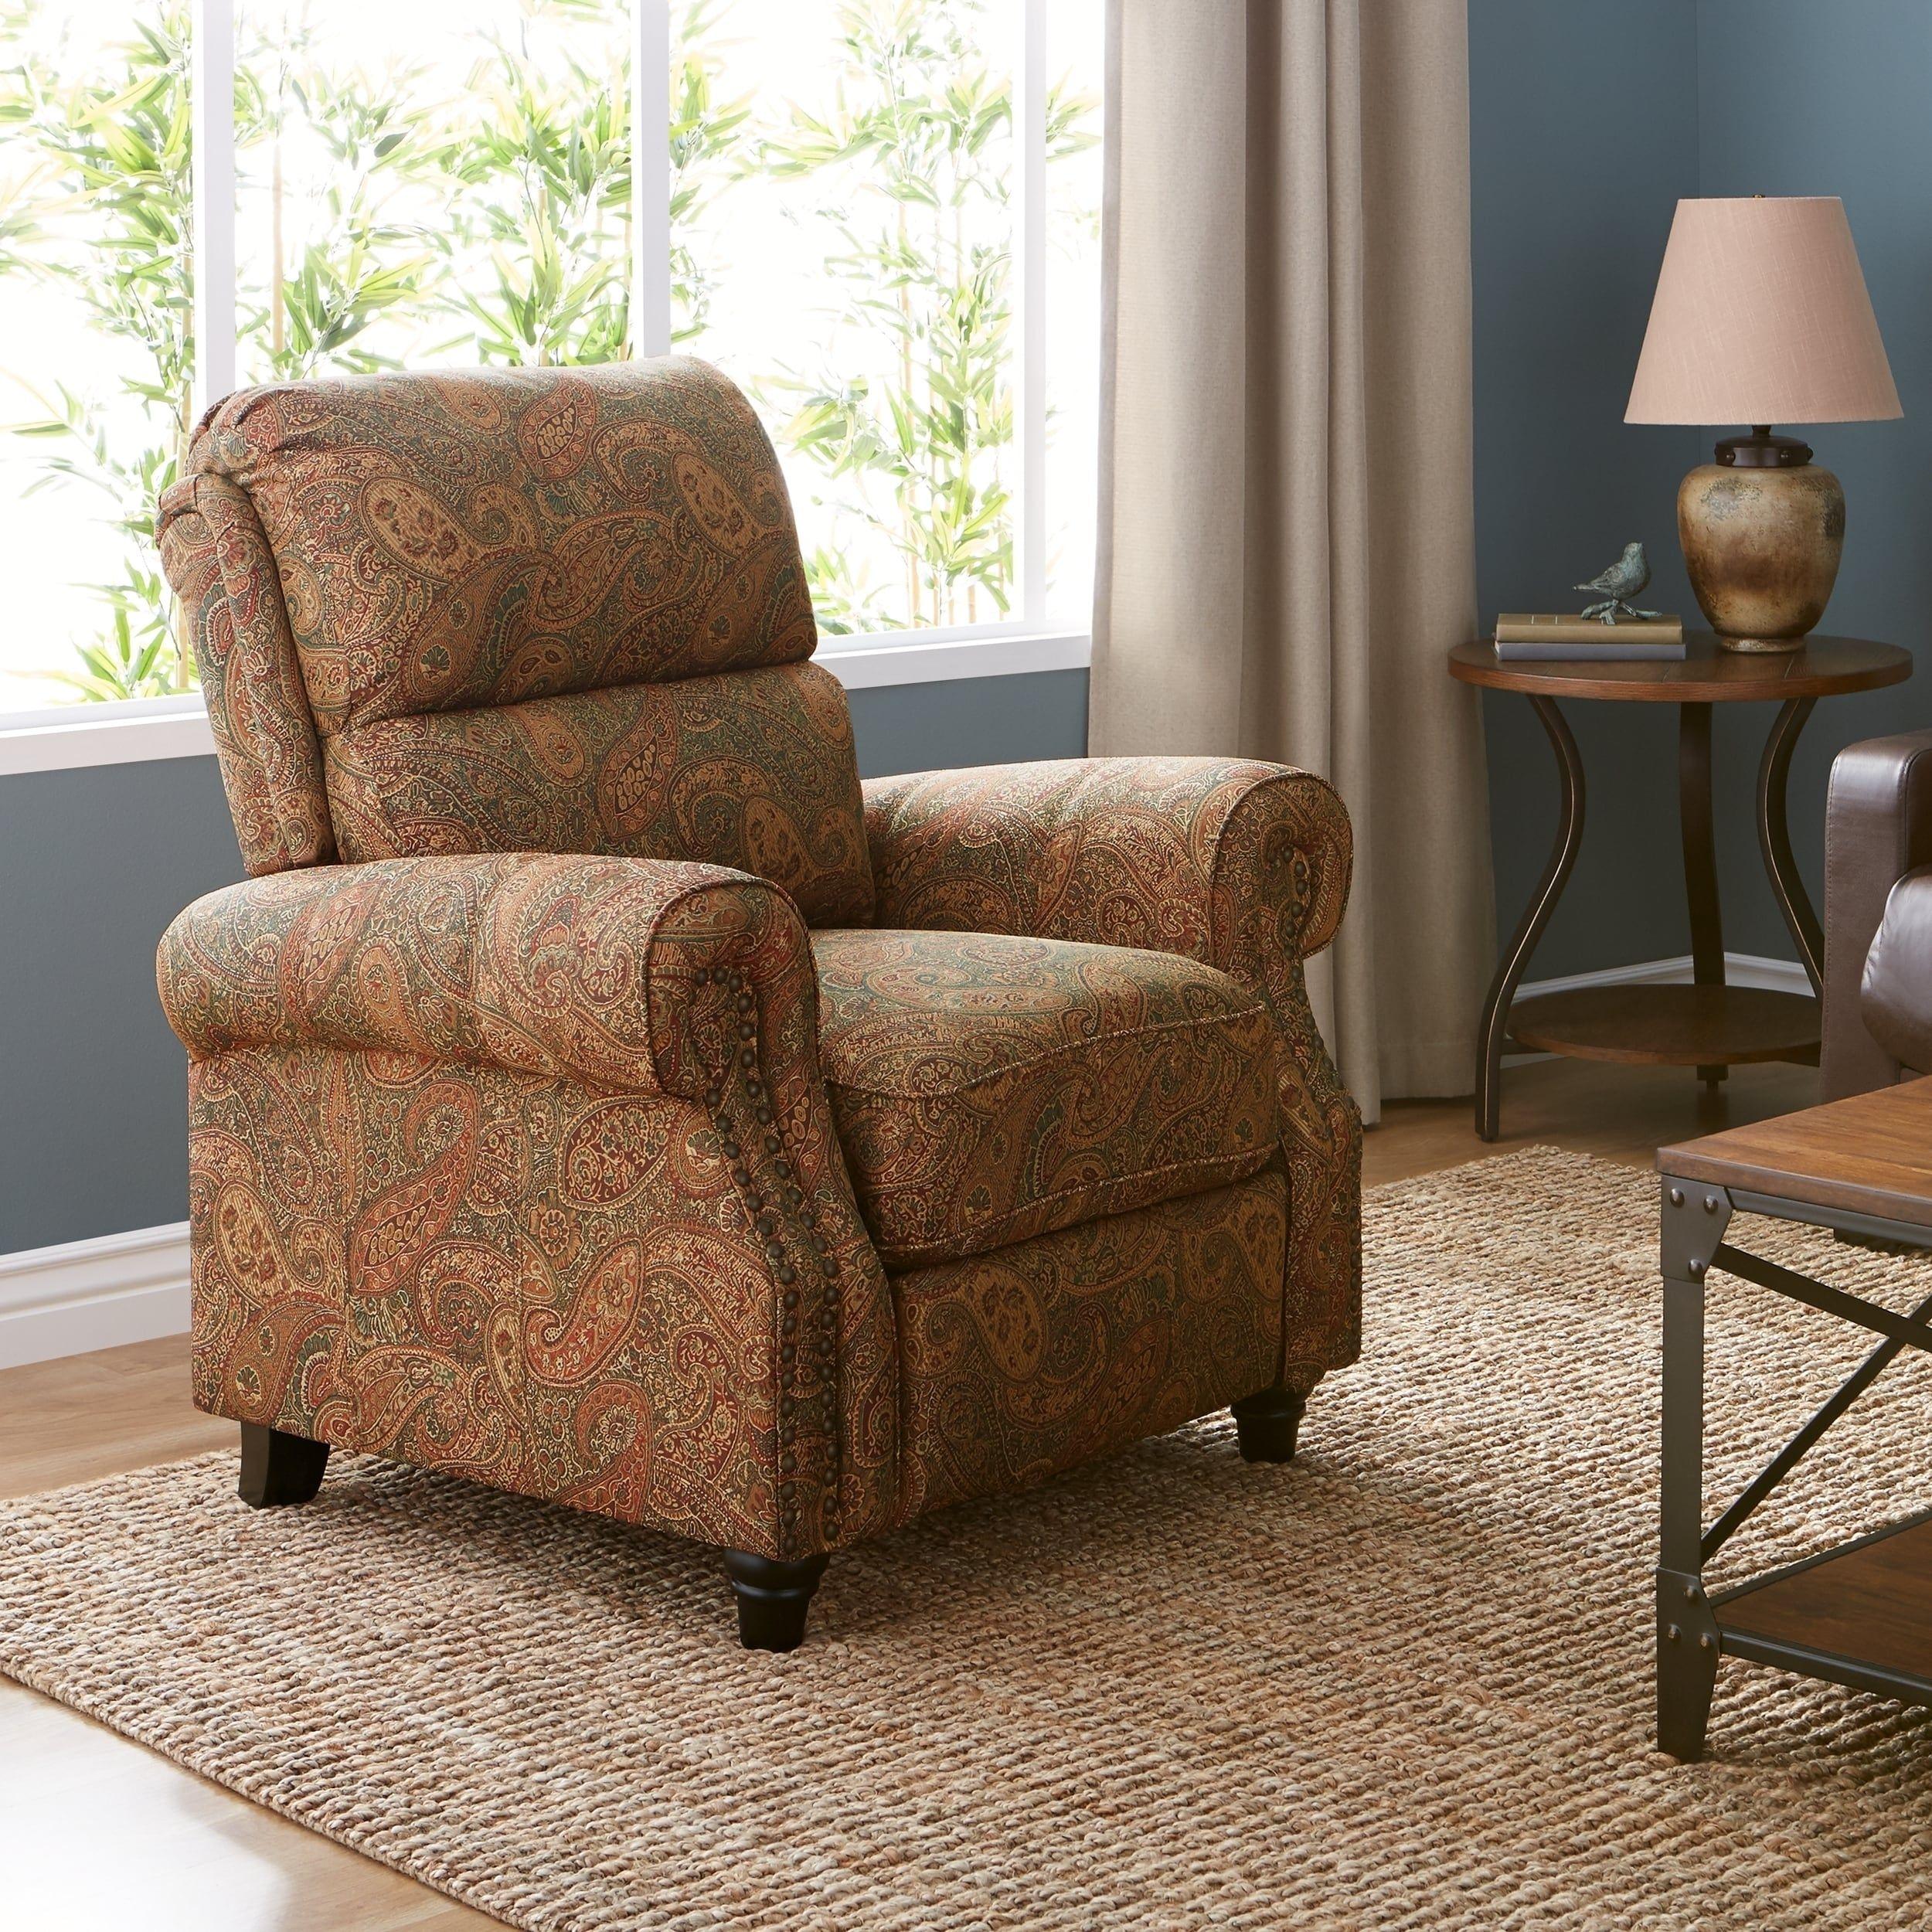 Groovy Copper Grove Jessie Prolounger Paisley Push Back Recliner Creativecarmelina Interior Chair Design Creativecarmelinacom